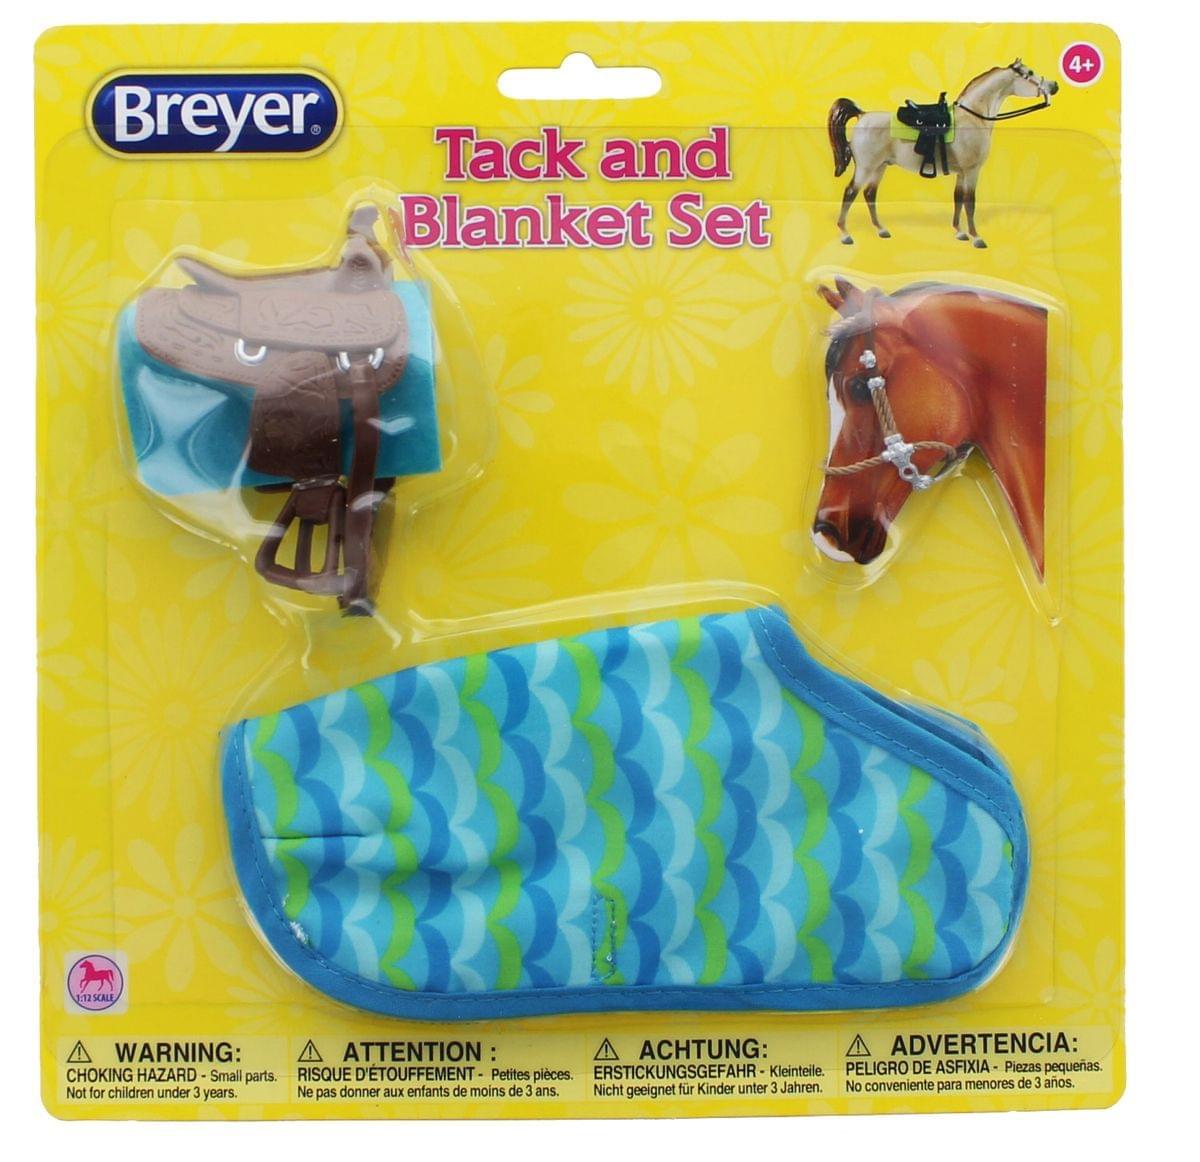 Breyer 1:12 Classic Model Horse Tack and Blanket Set, Blue & Green